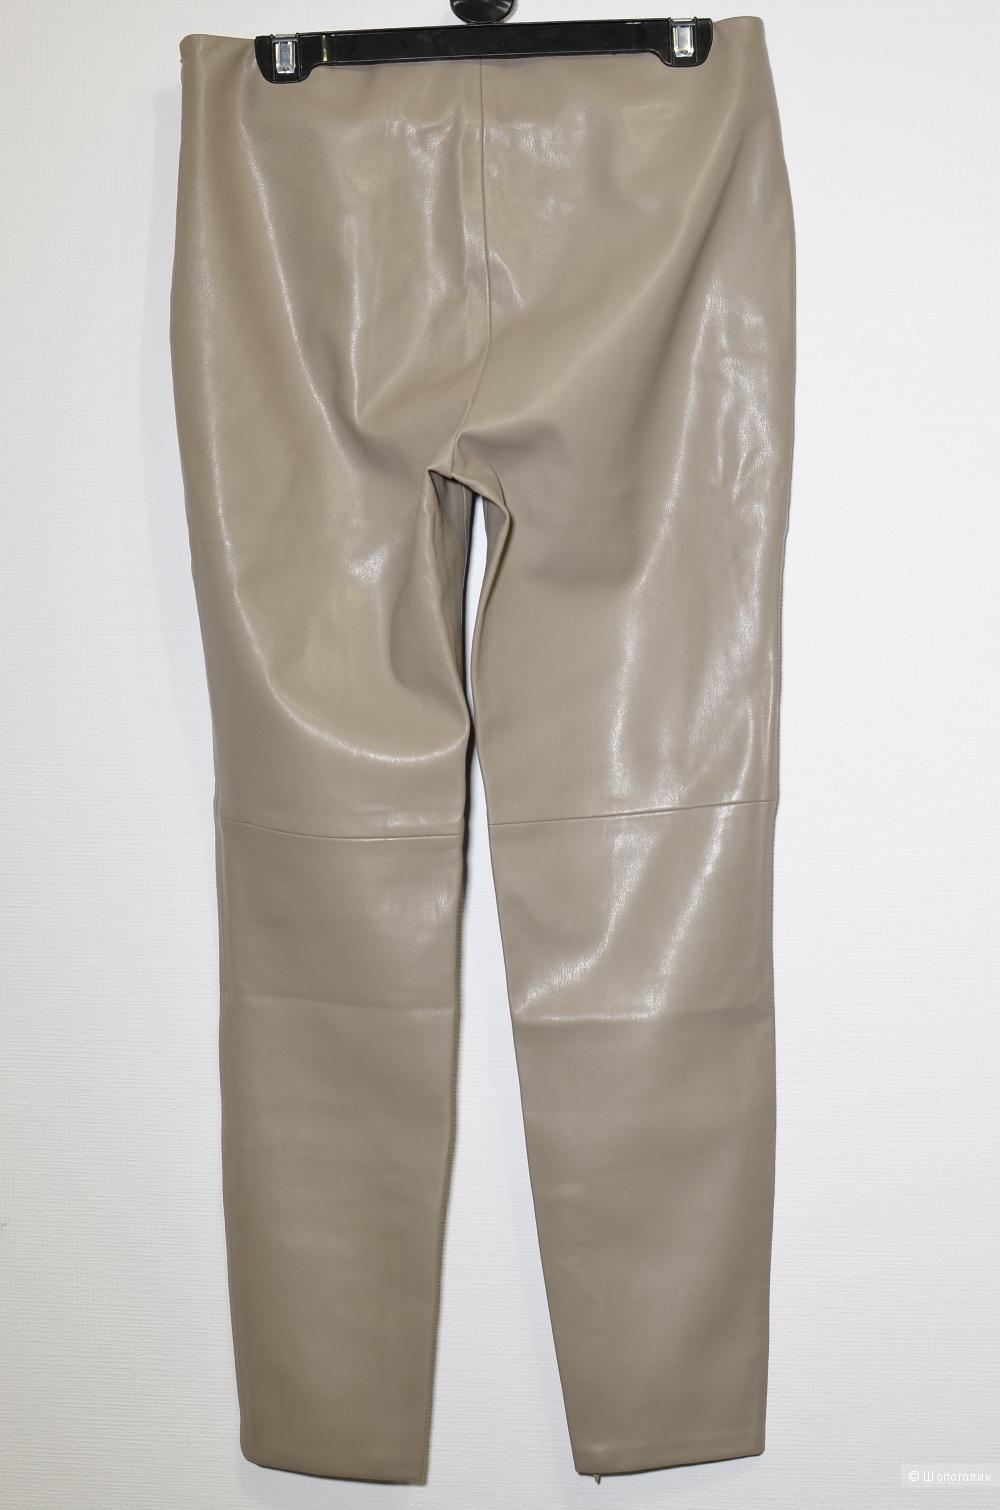 Брюки Zara эко-кожа, размер L